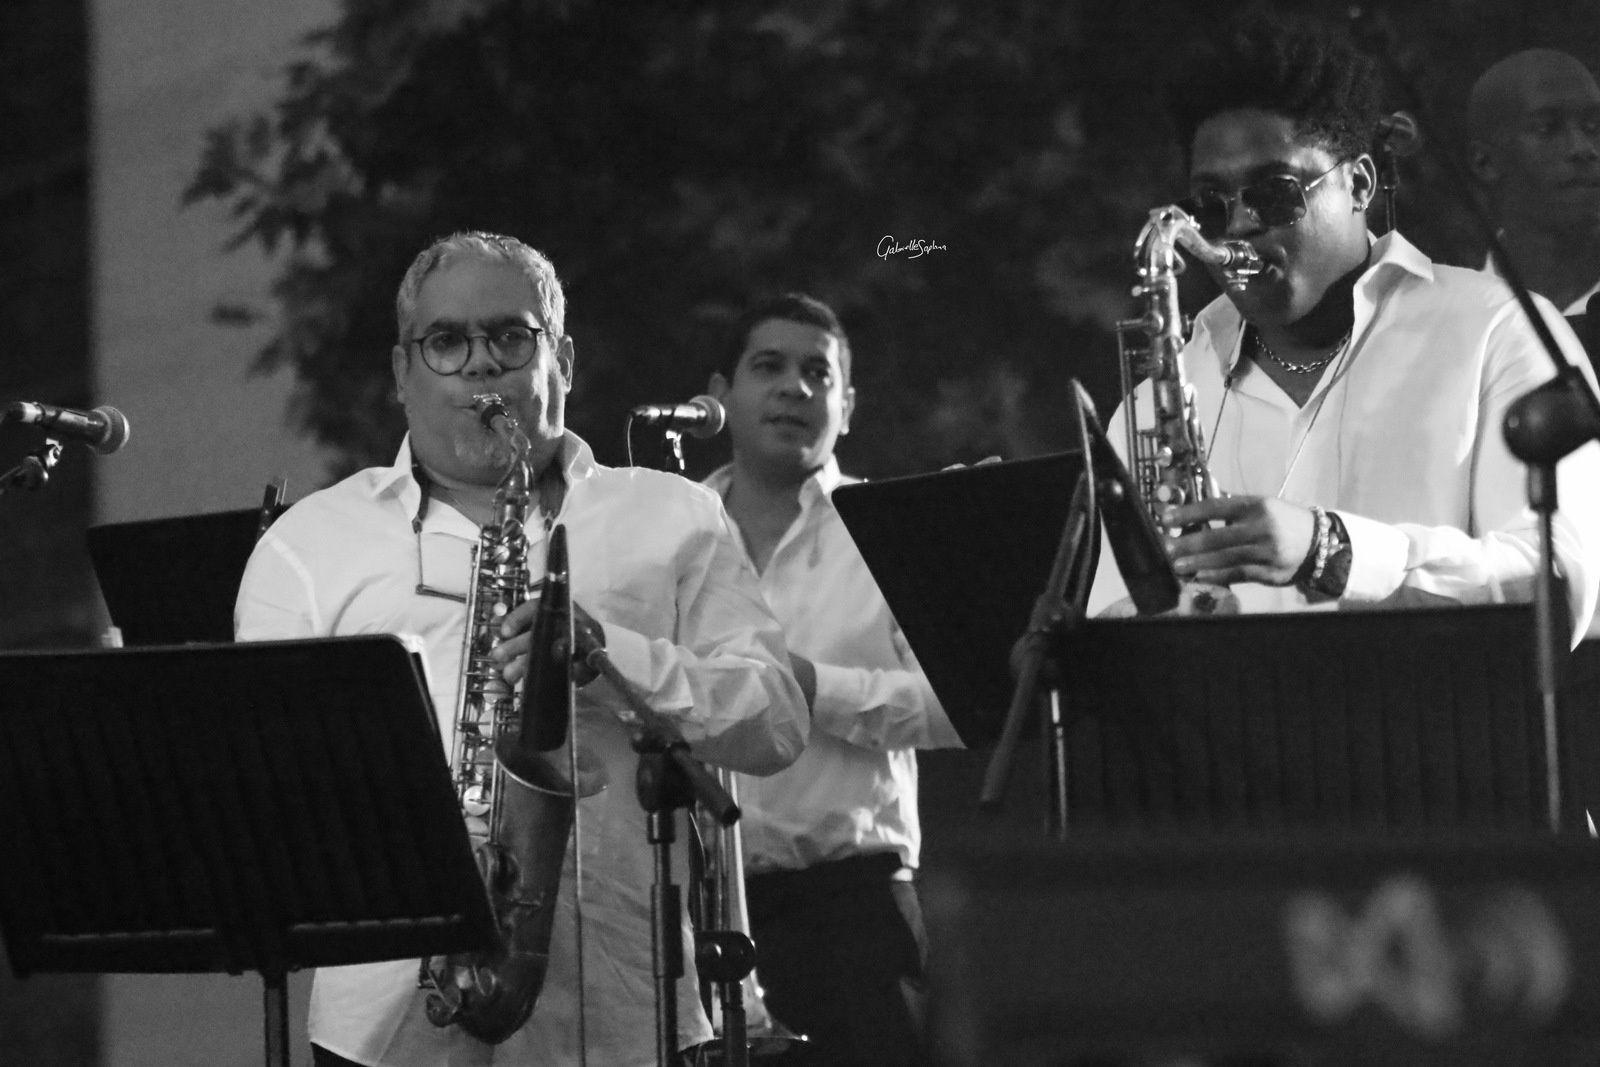 Orquesta Akokán/ Cimafunk, Veranos de la Villa 2019, Madrid